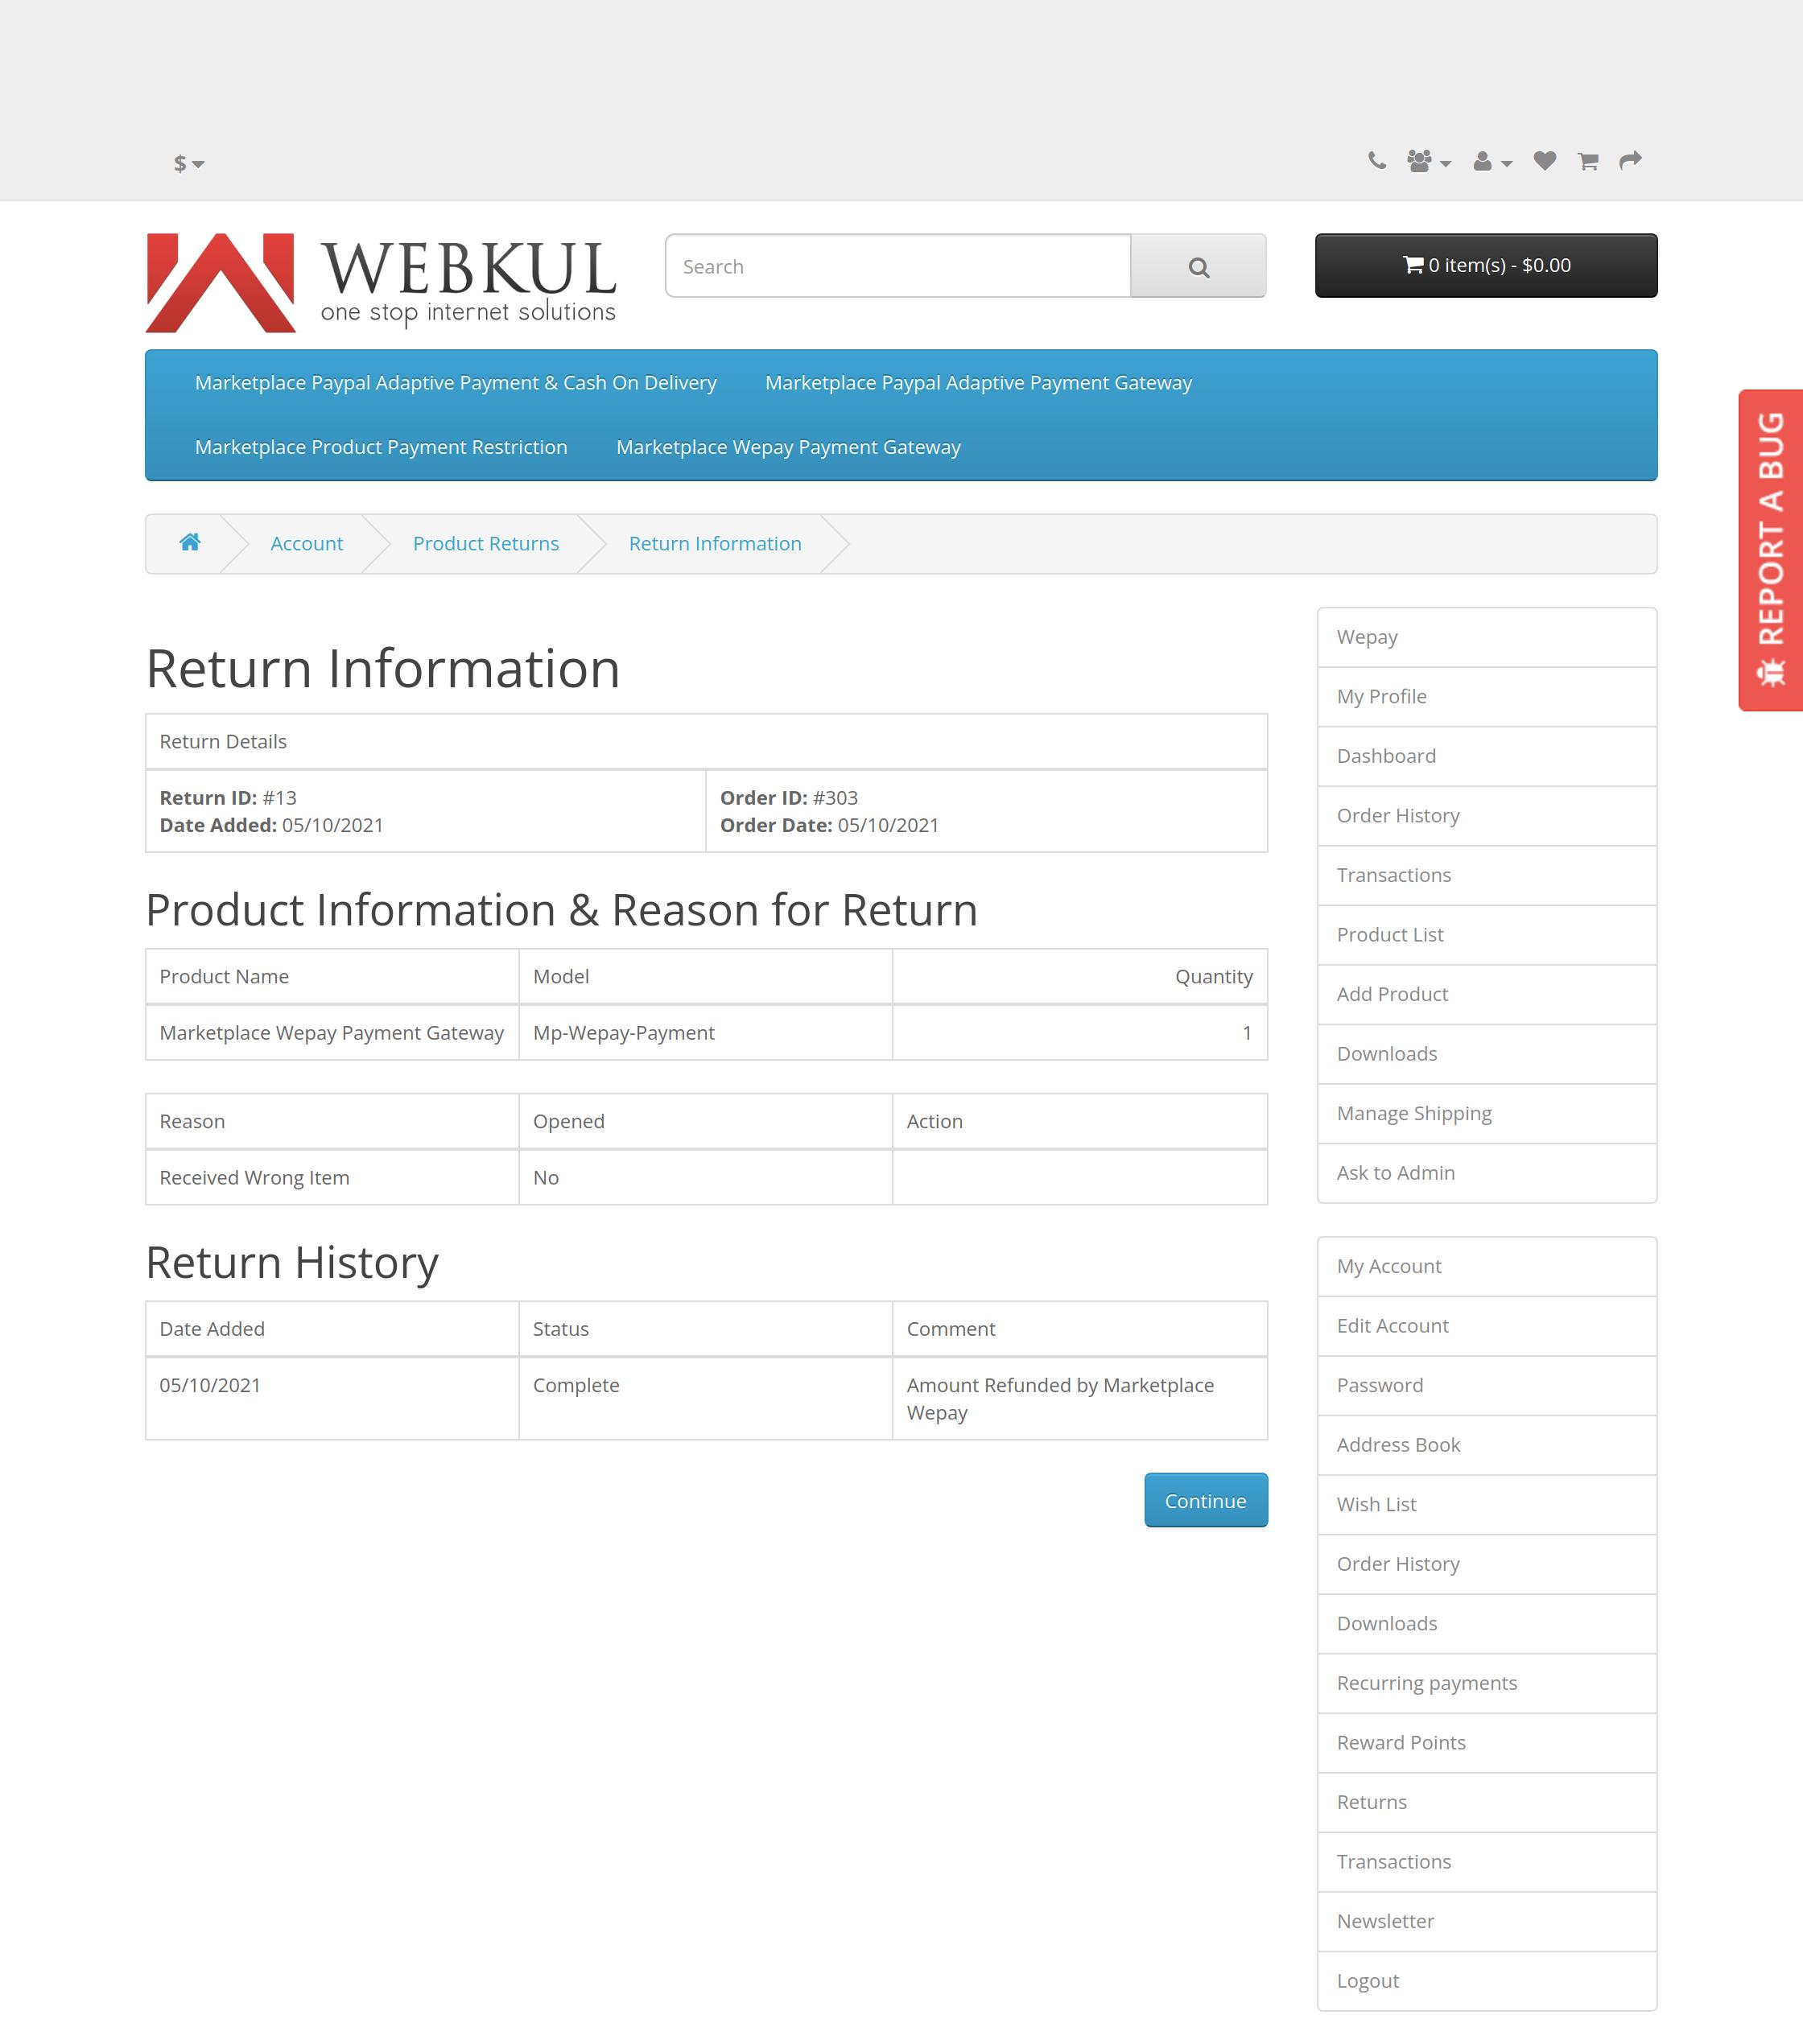 opencartdemo.webkul.com_mp-adaptive-paypal-103-80-65-178-demo_index.php_routeaccount_return_inforeturn_id13-1-2